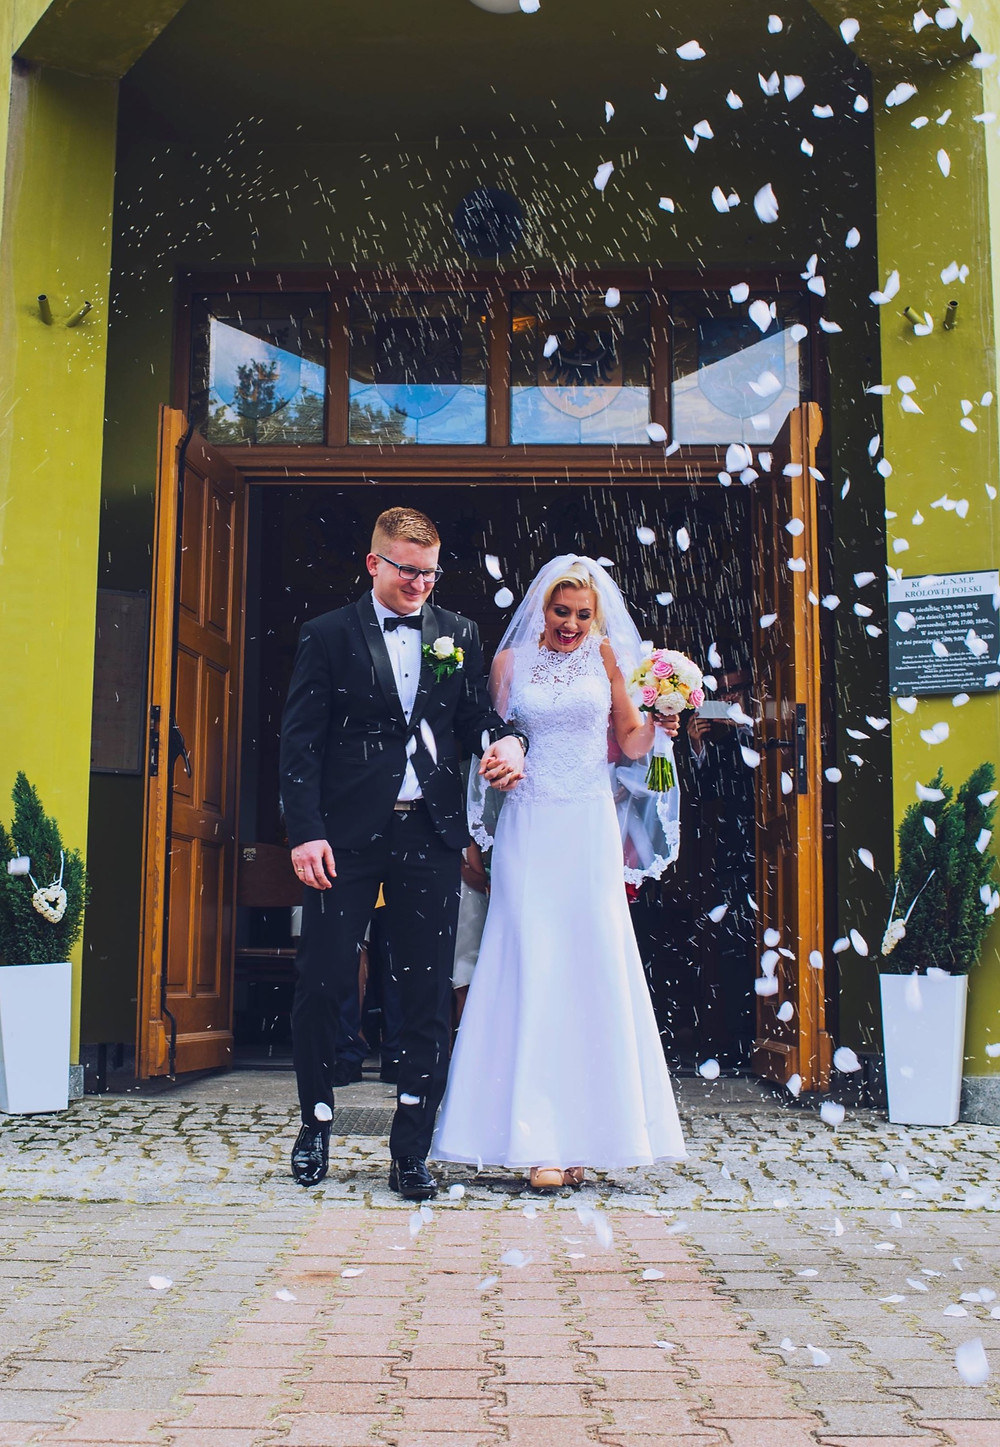 Polish wedding in front of church